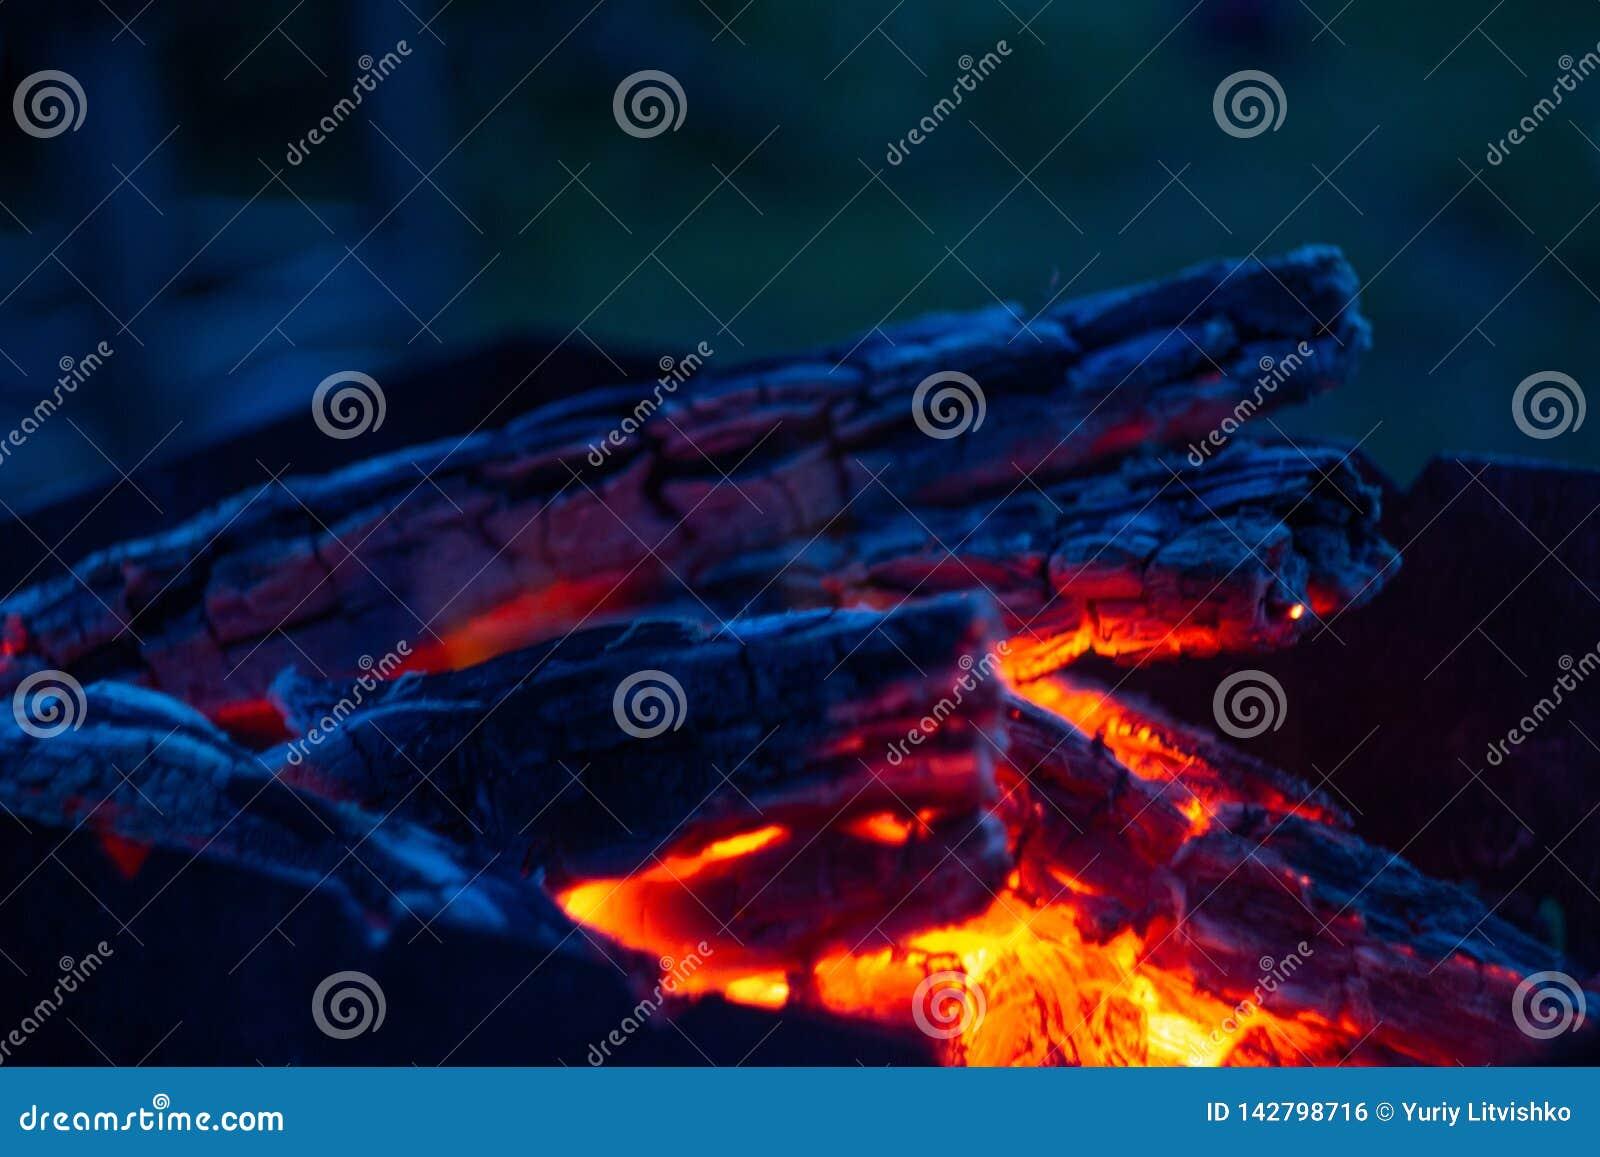 Burning coals in the fireplase